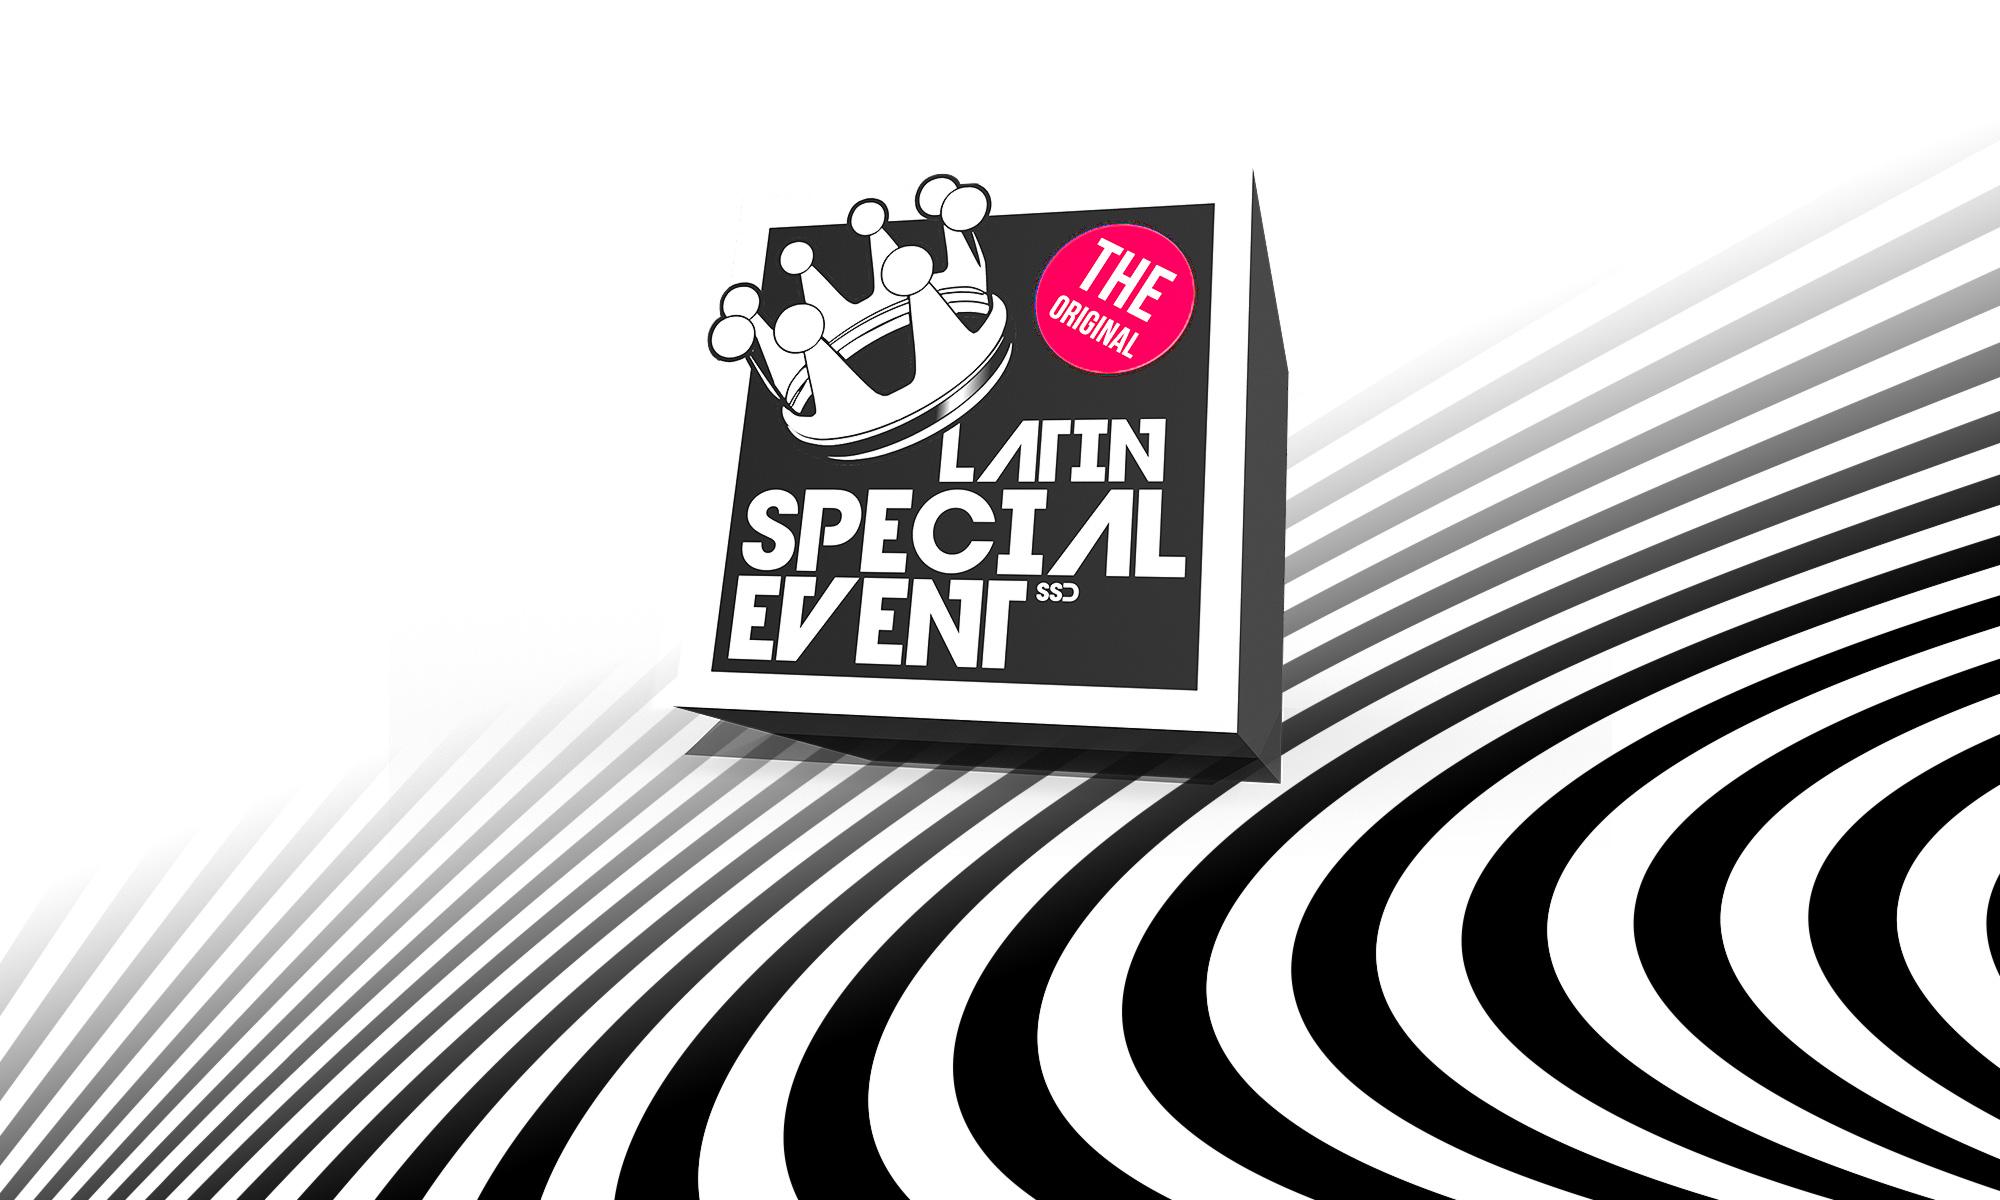 LatinSpecialEvent